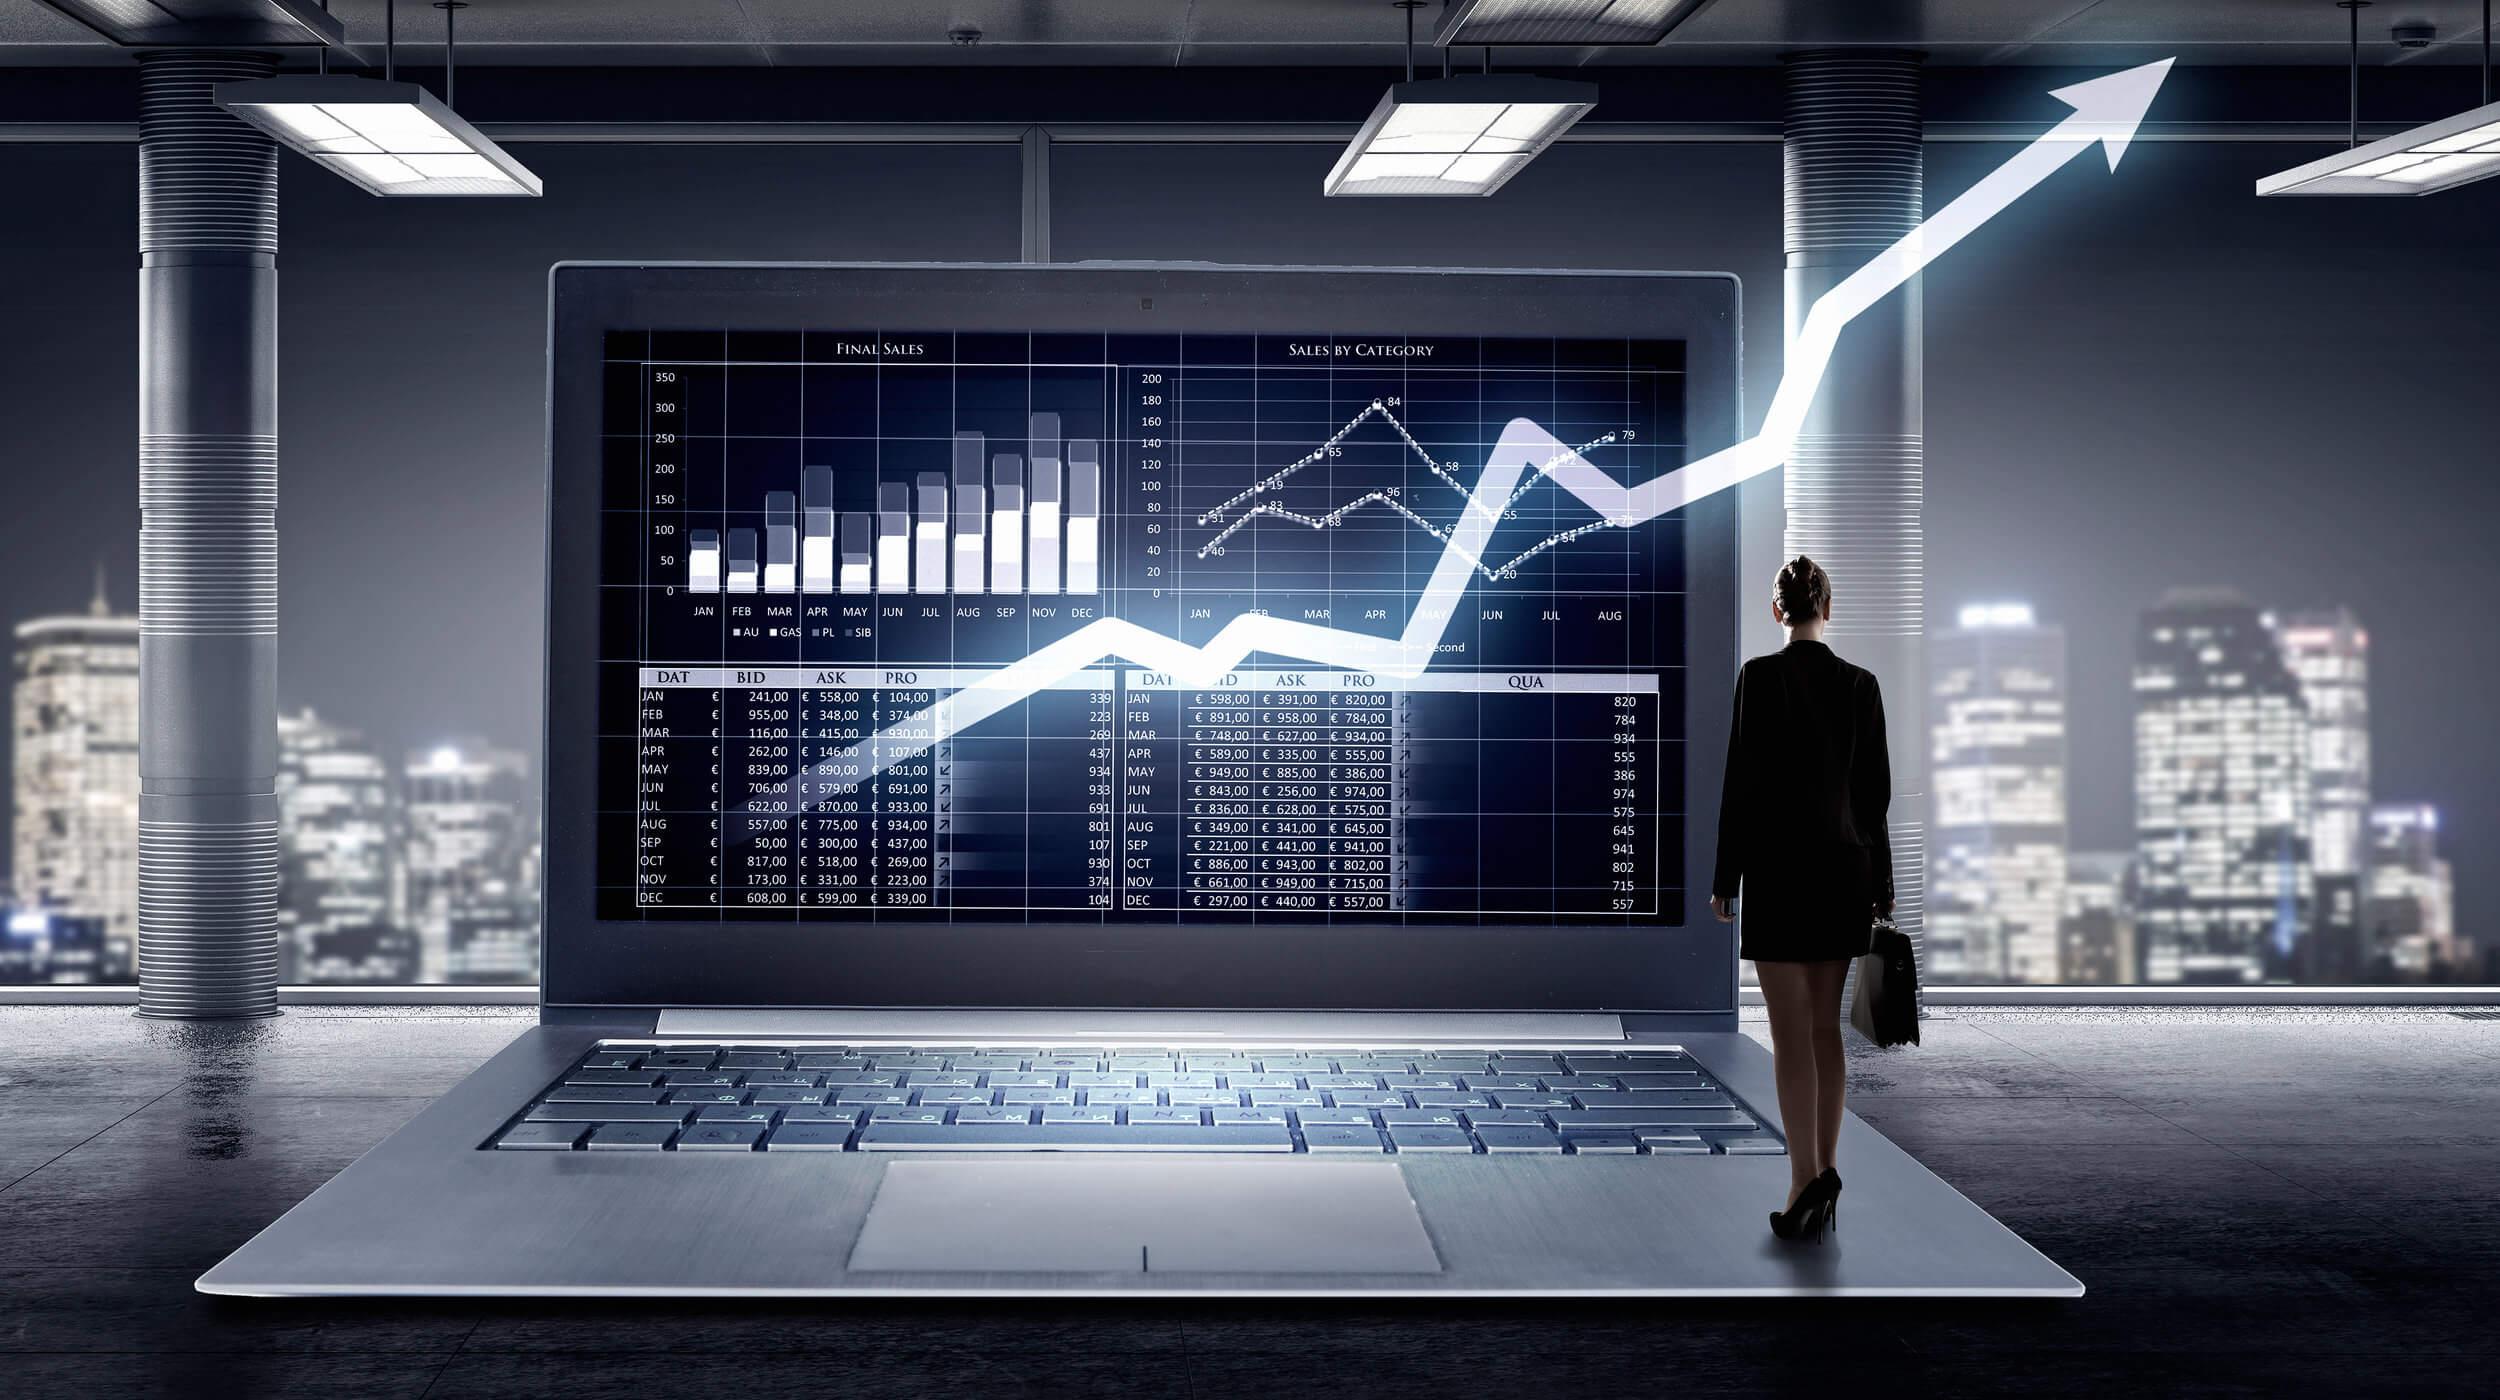 The advantages of data-driven management